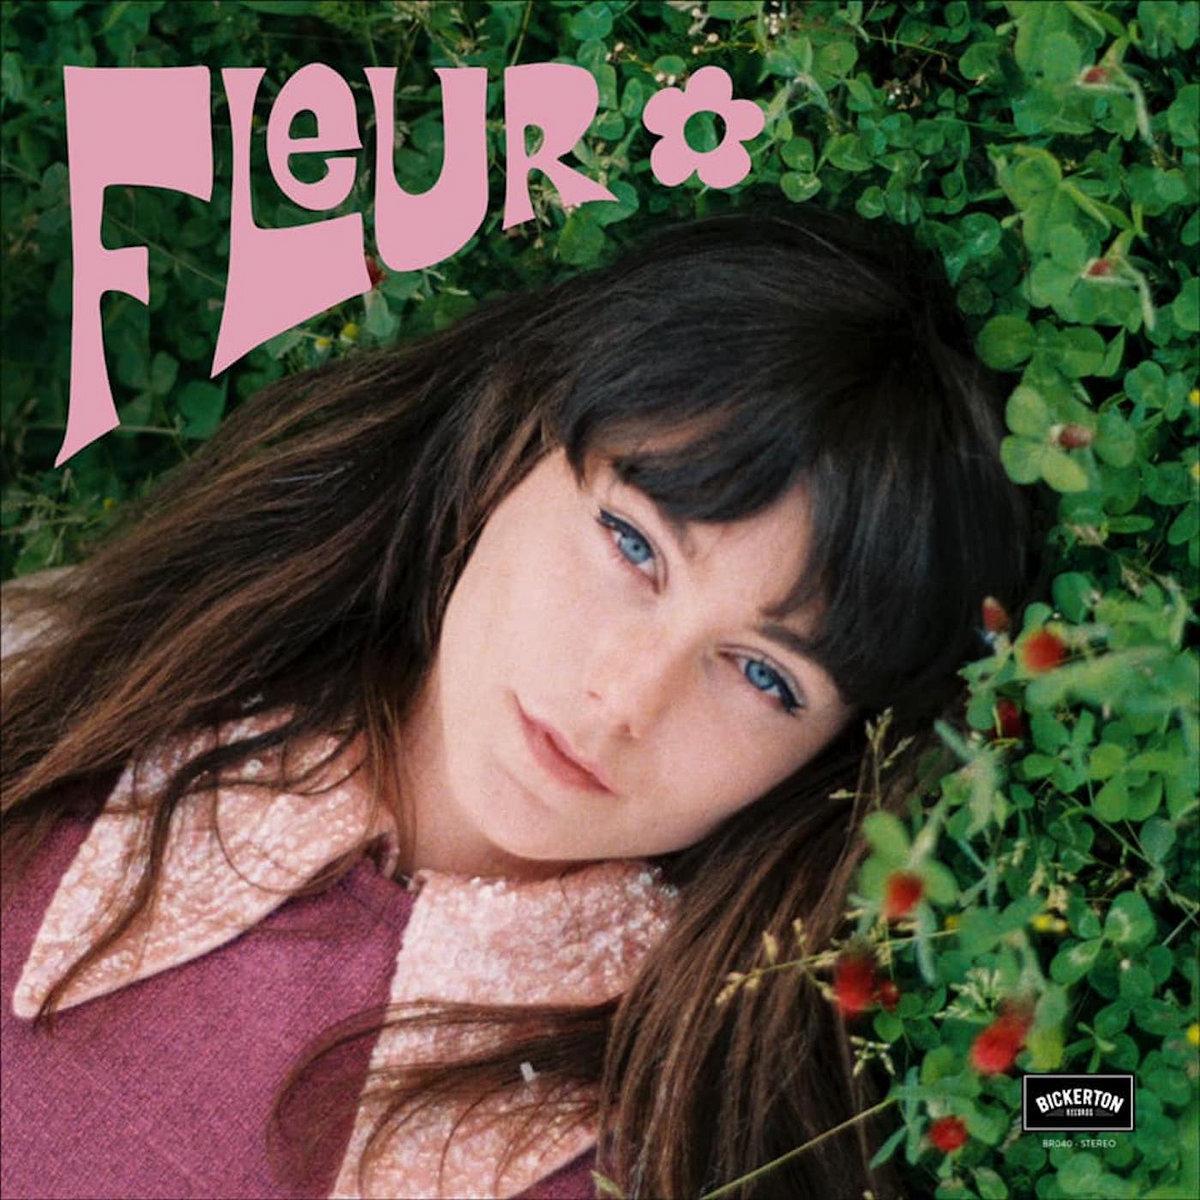 Fleur - Fleur [LP]